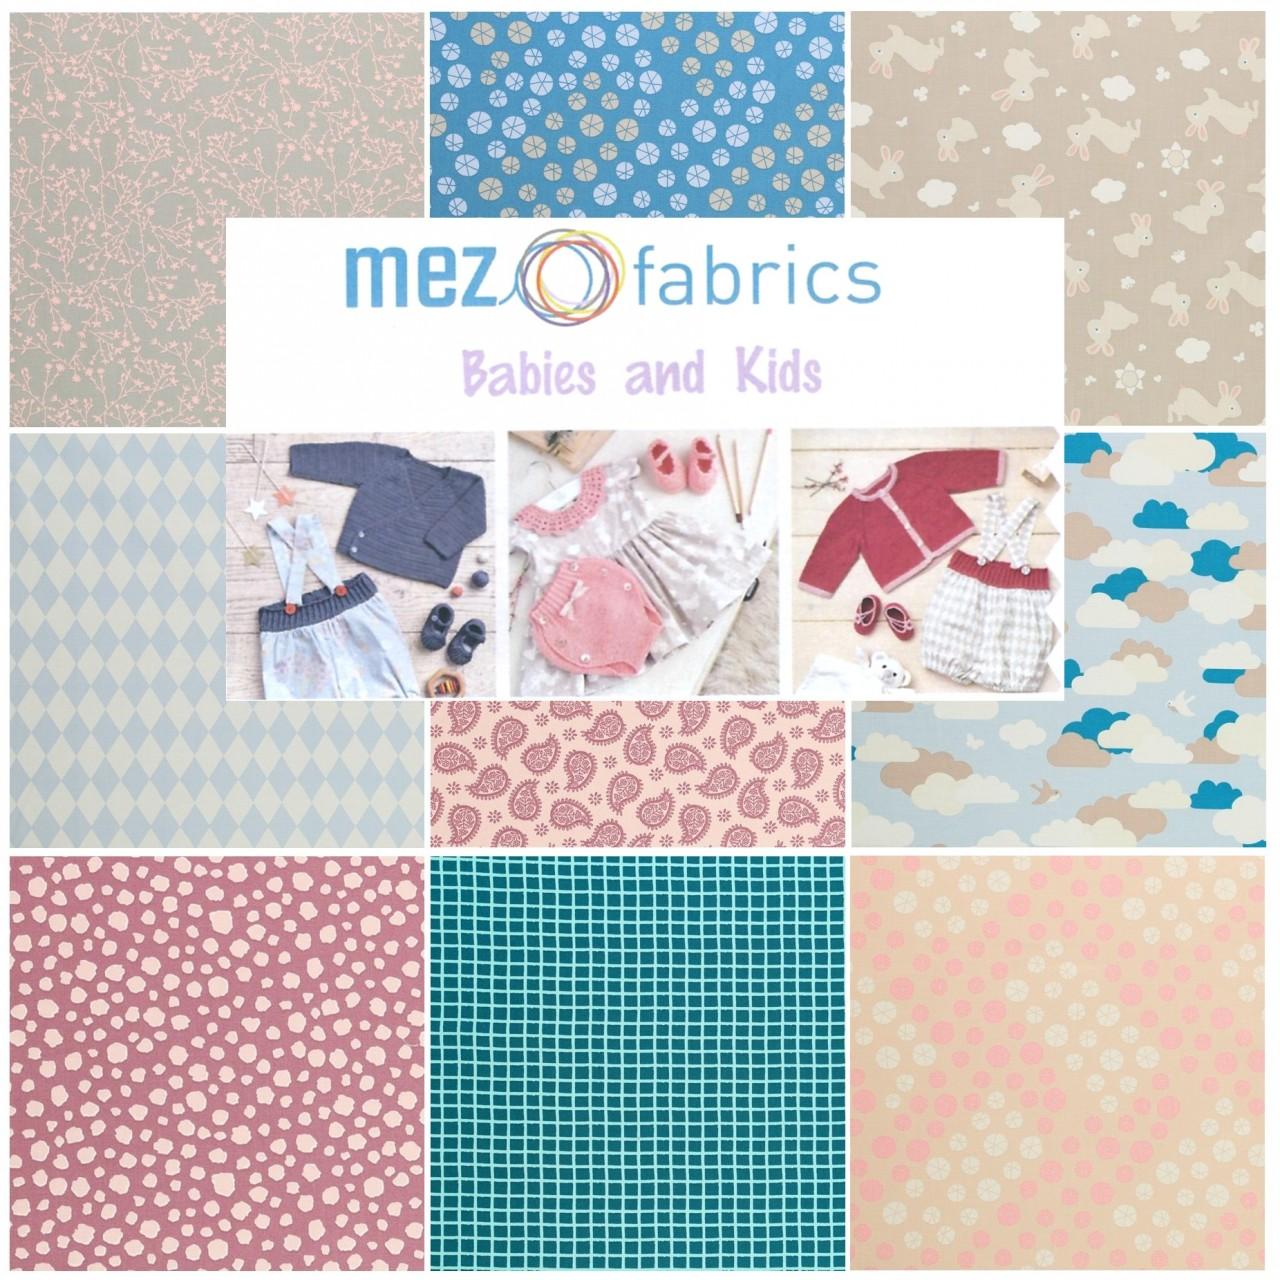 MEZ fabrics baby love wollzauber Babystoffe